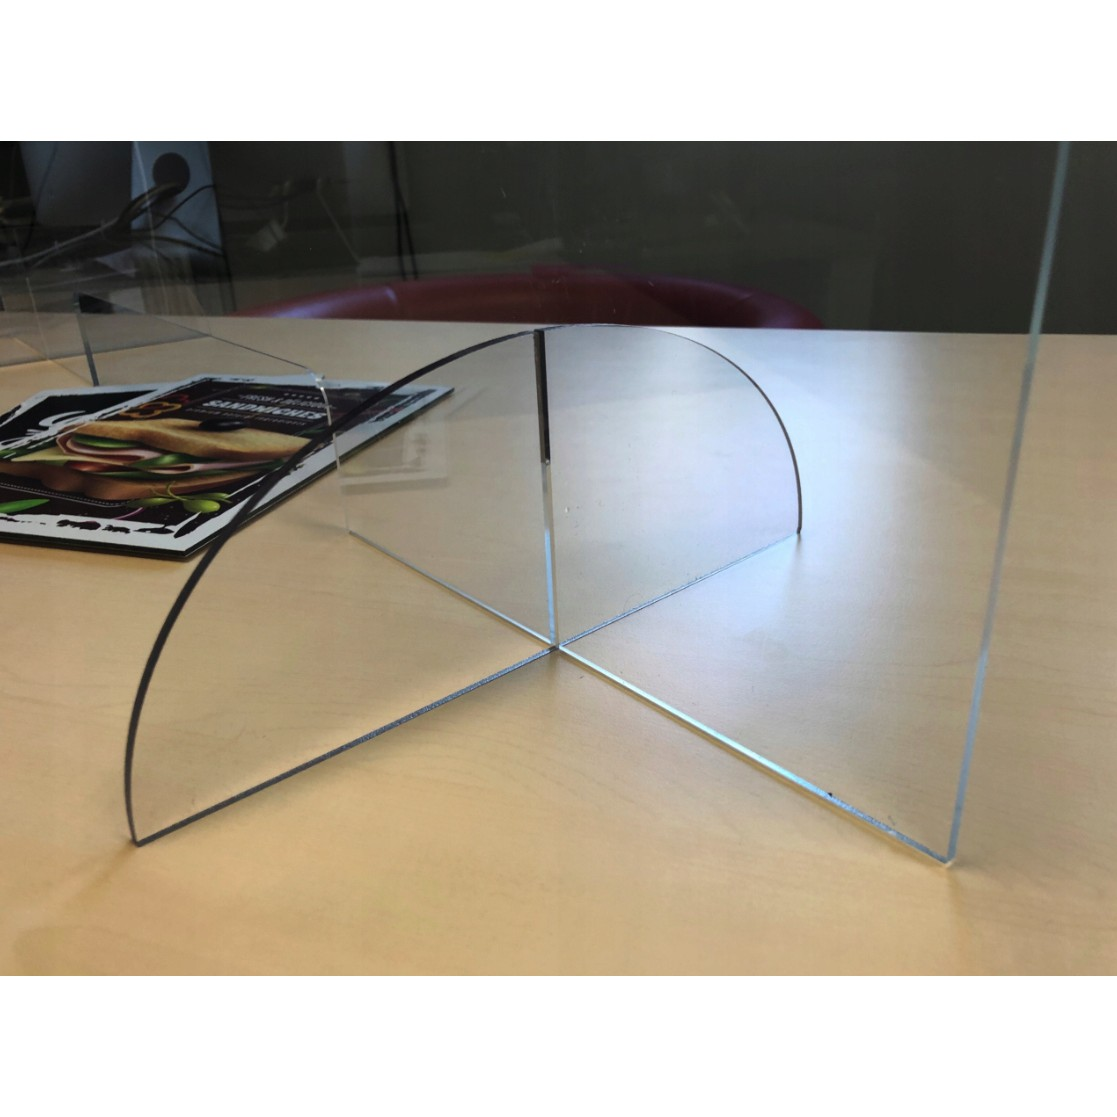 ochranné plexisklo na pult s otvorom polykarbonátová ochranná bariéra megamix.sk